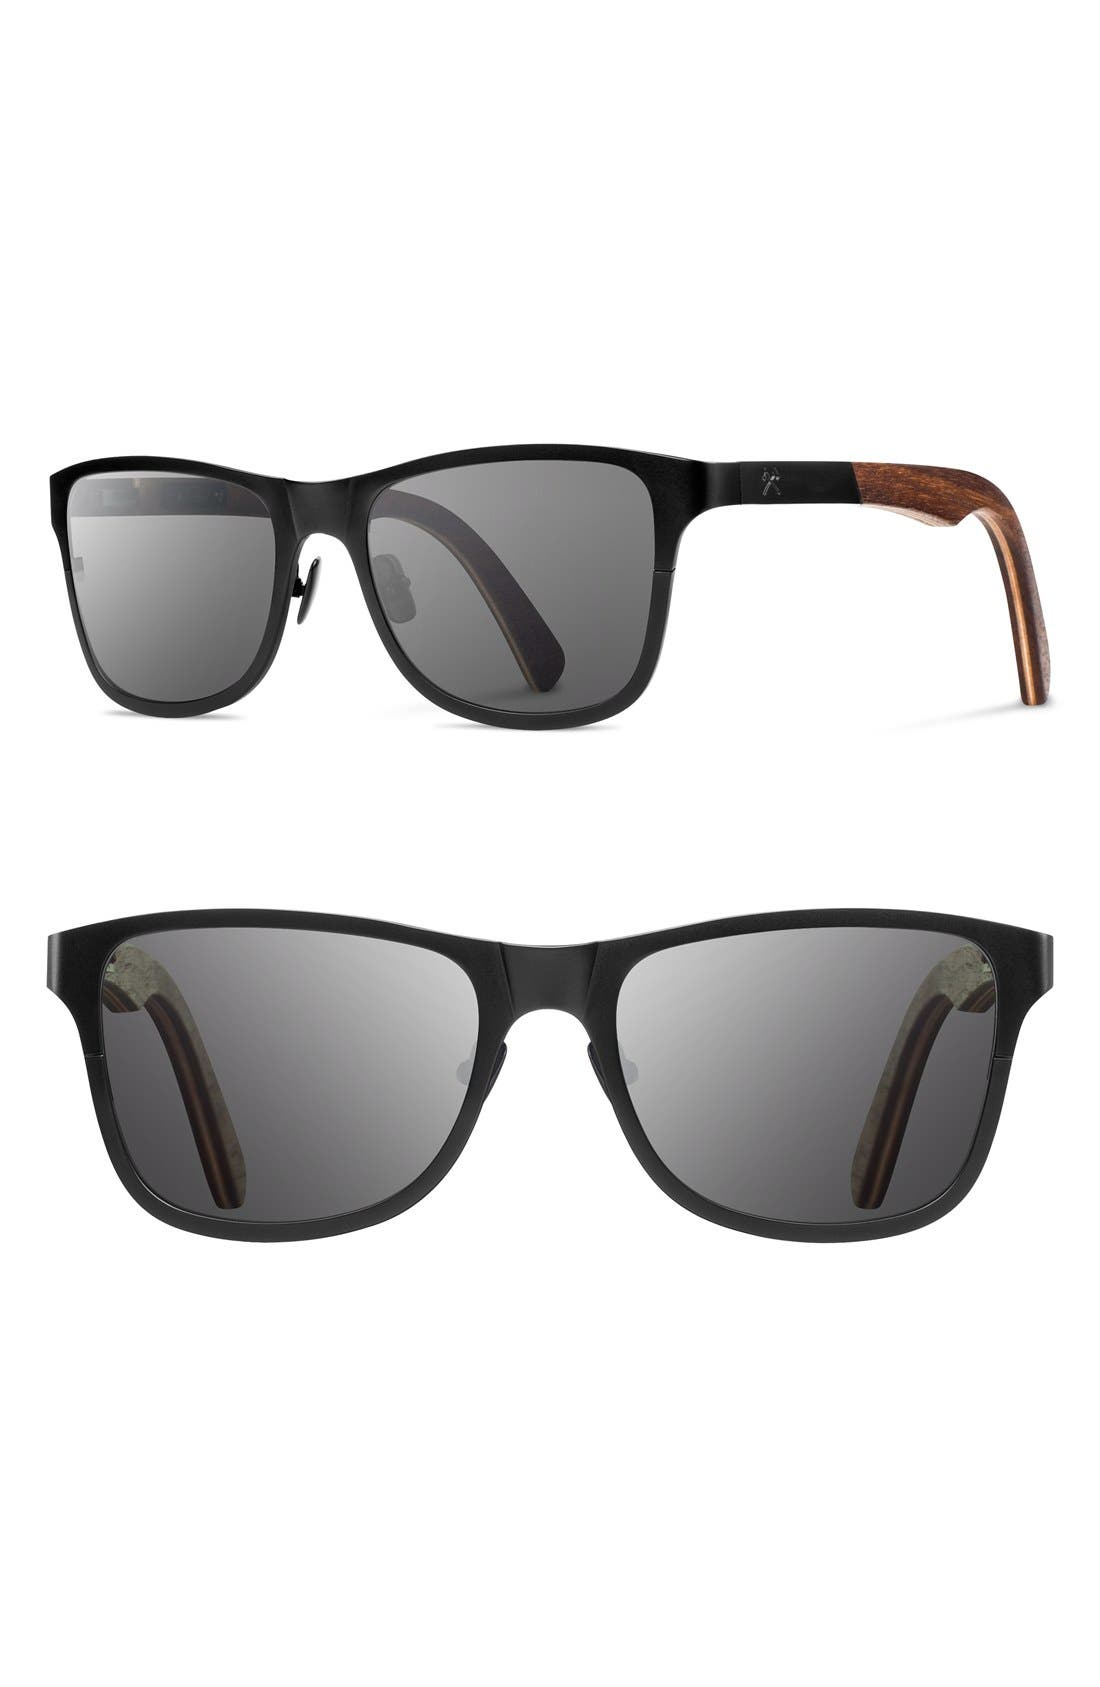 'Canby' 54mm Titanium & Wood Sunglasses,                             Main thumbnail 1, color,                             BLACK/ WALNUT